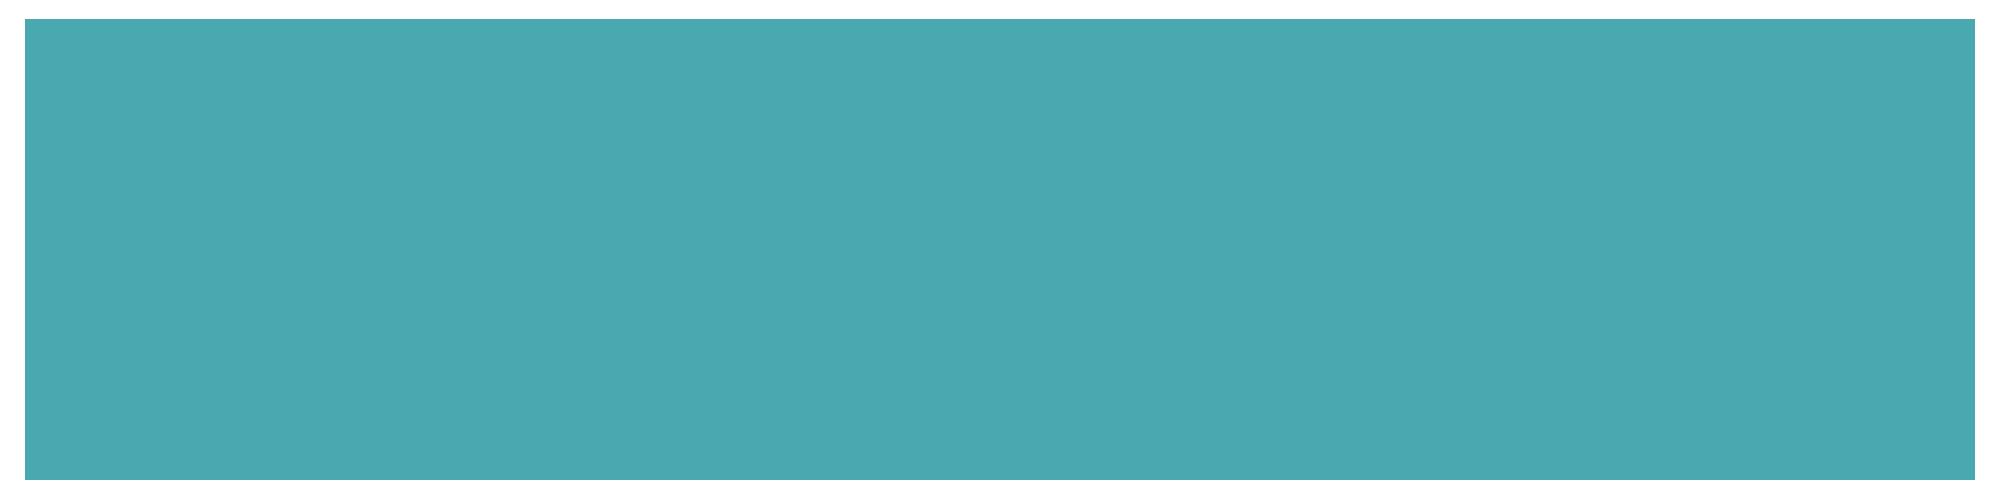 Textmark